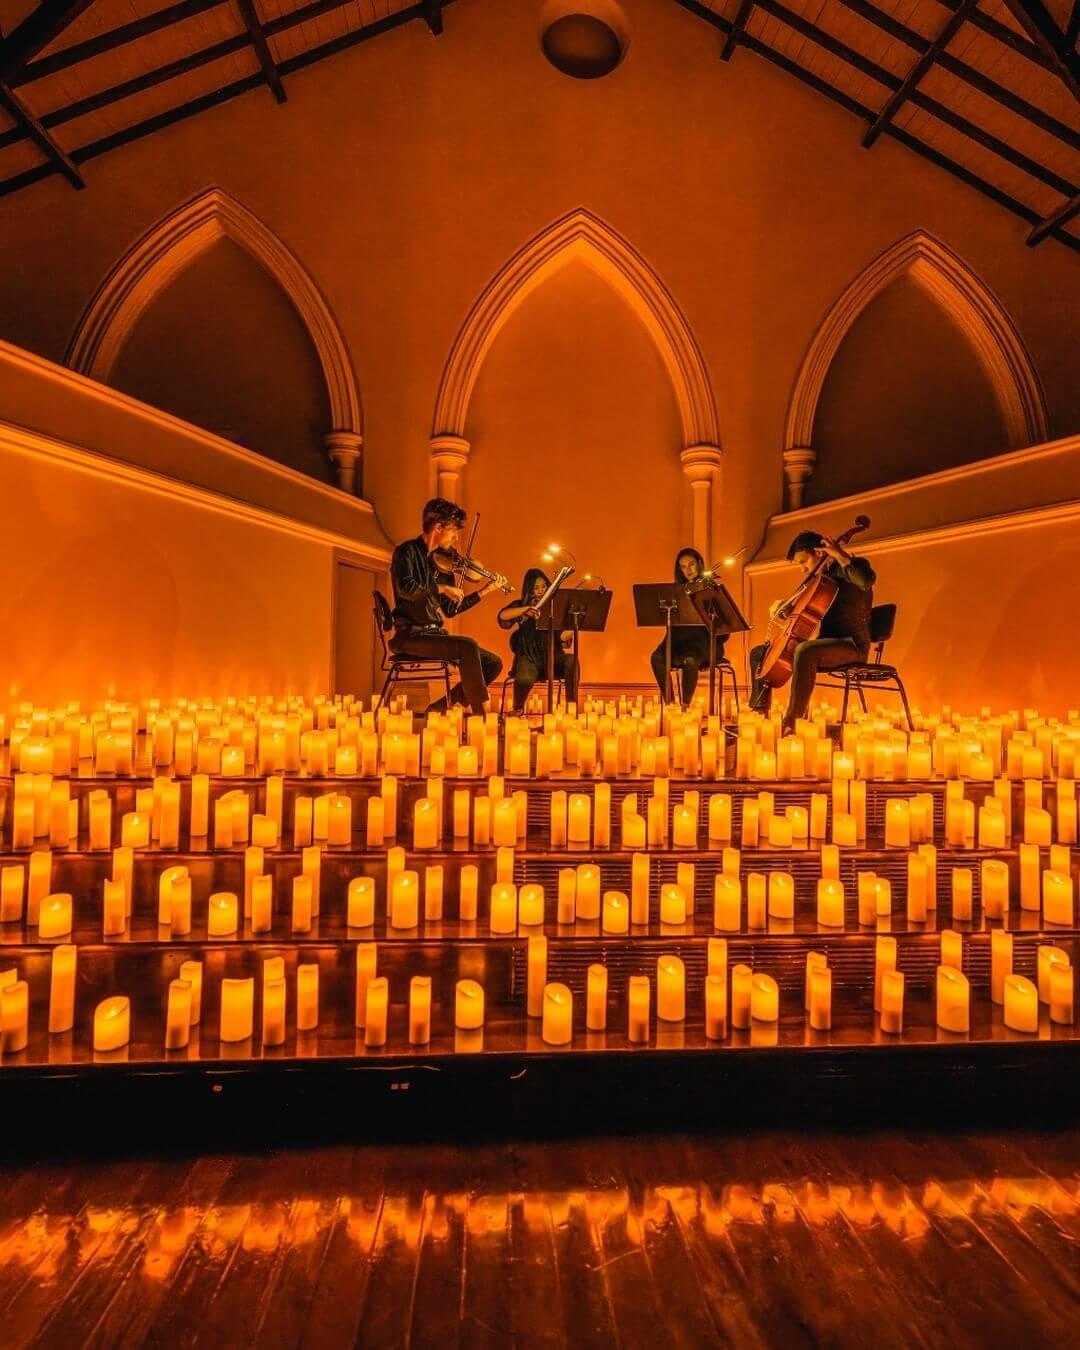 concerti lume candela